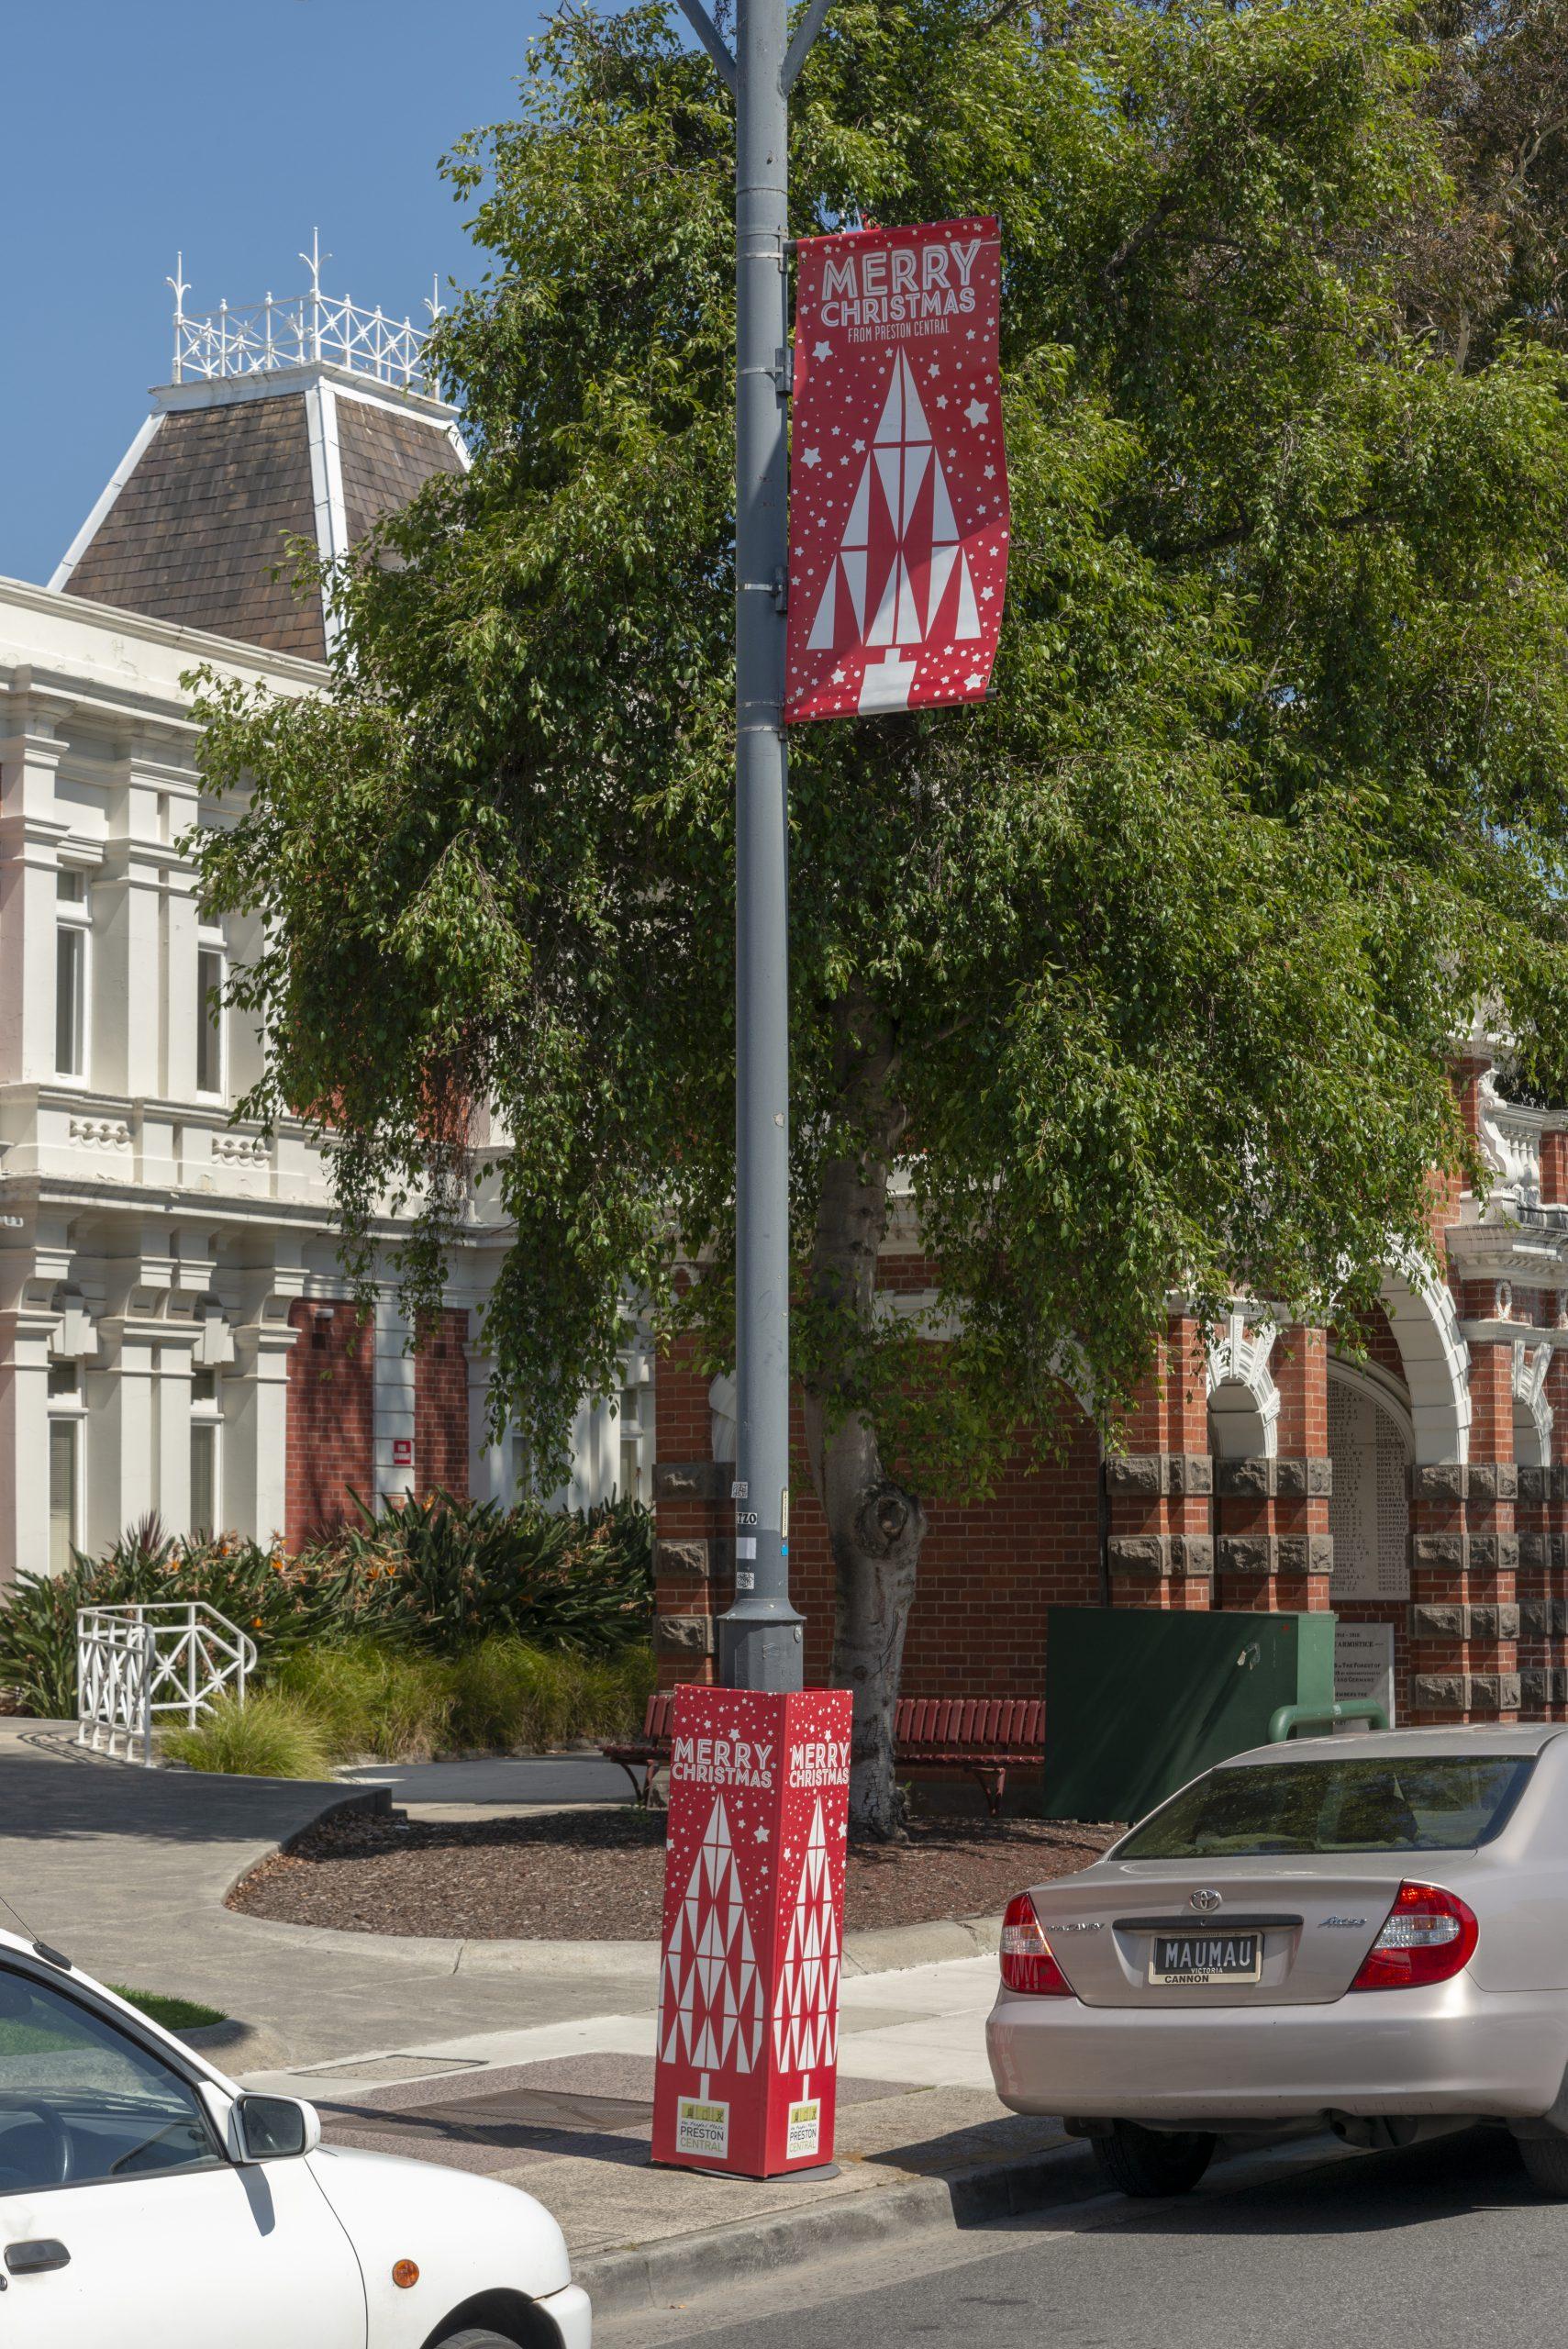 Street pole with Christmas wrap